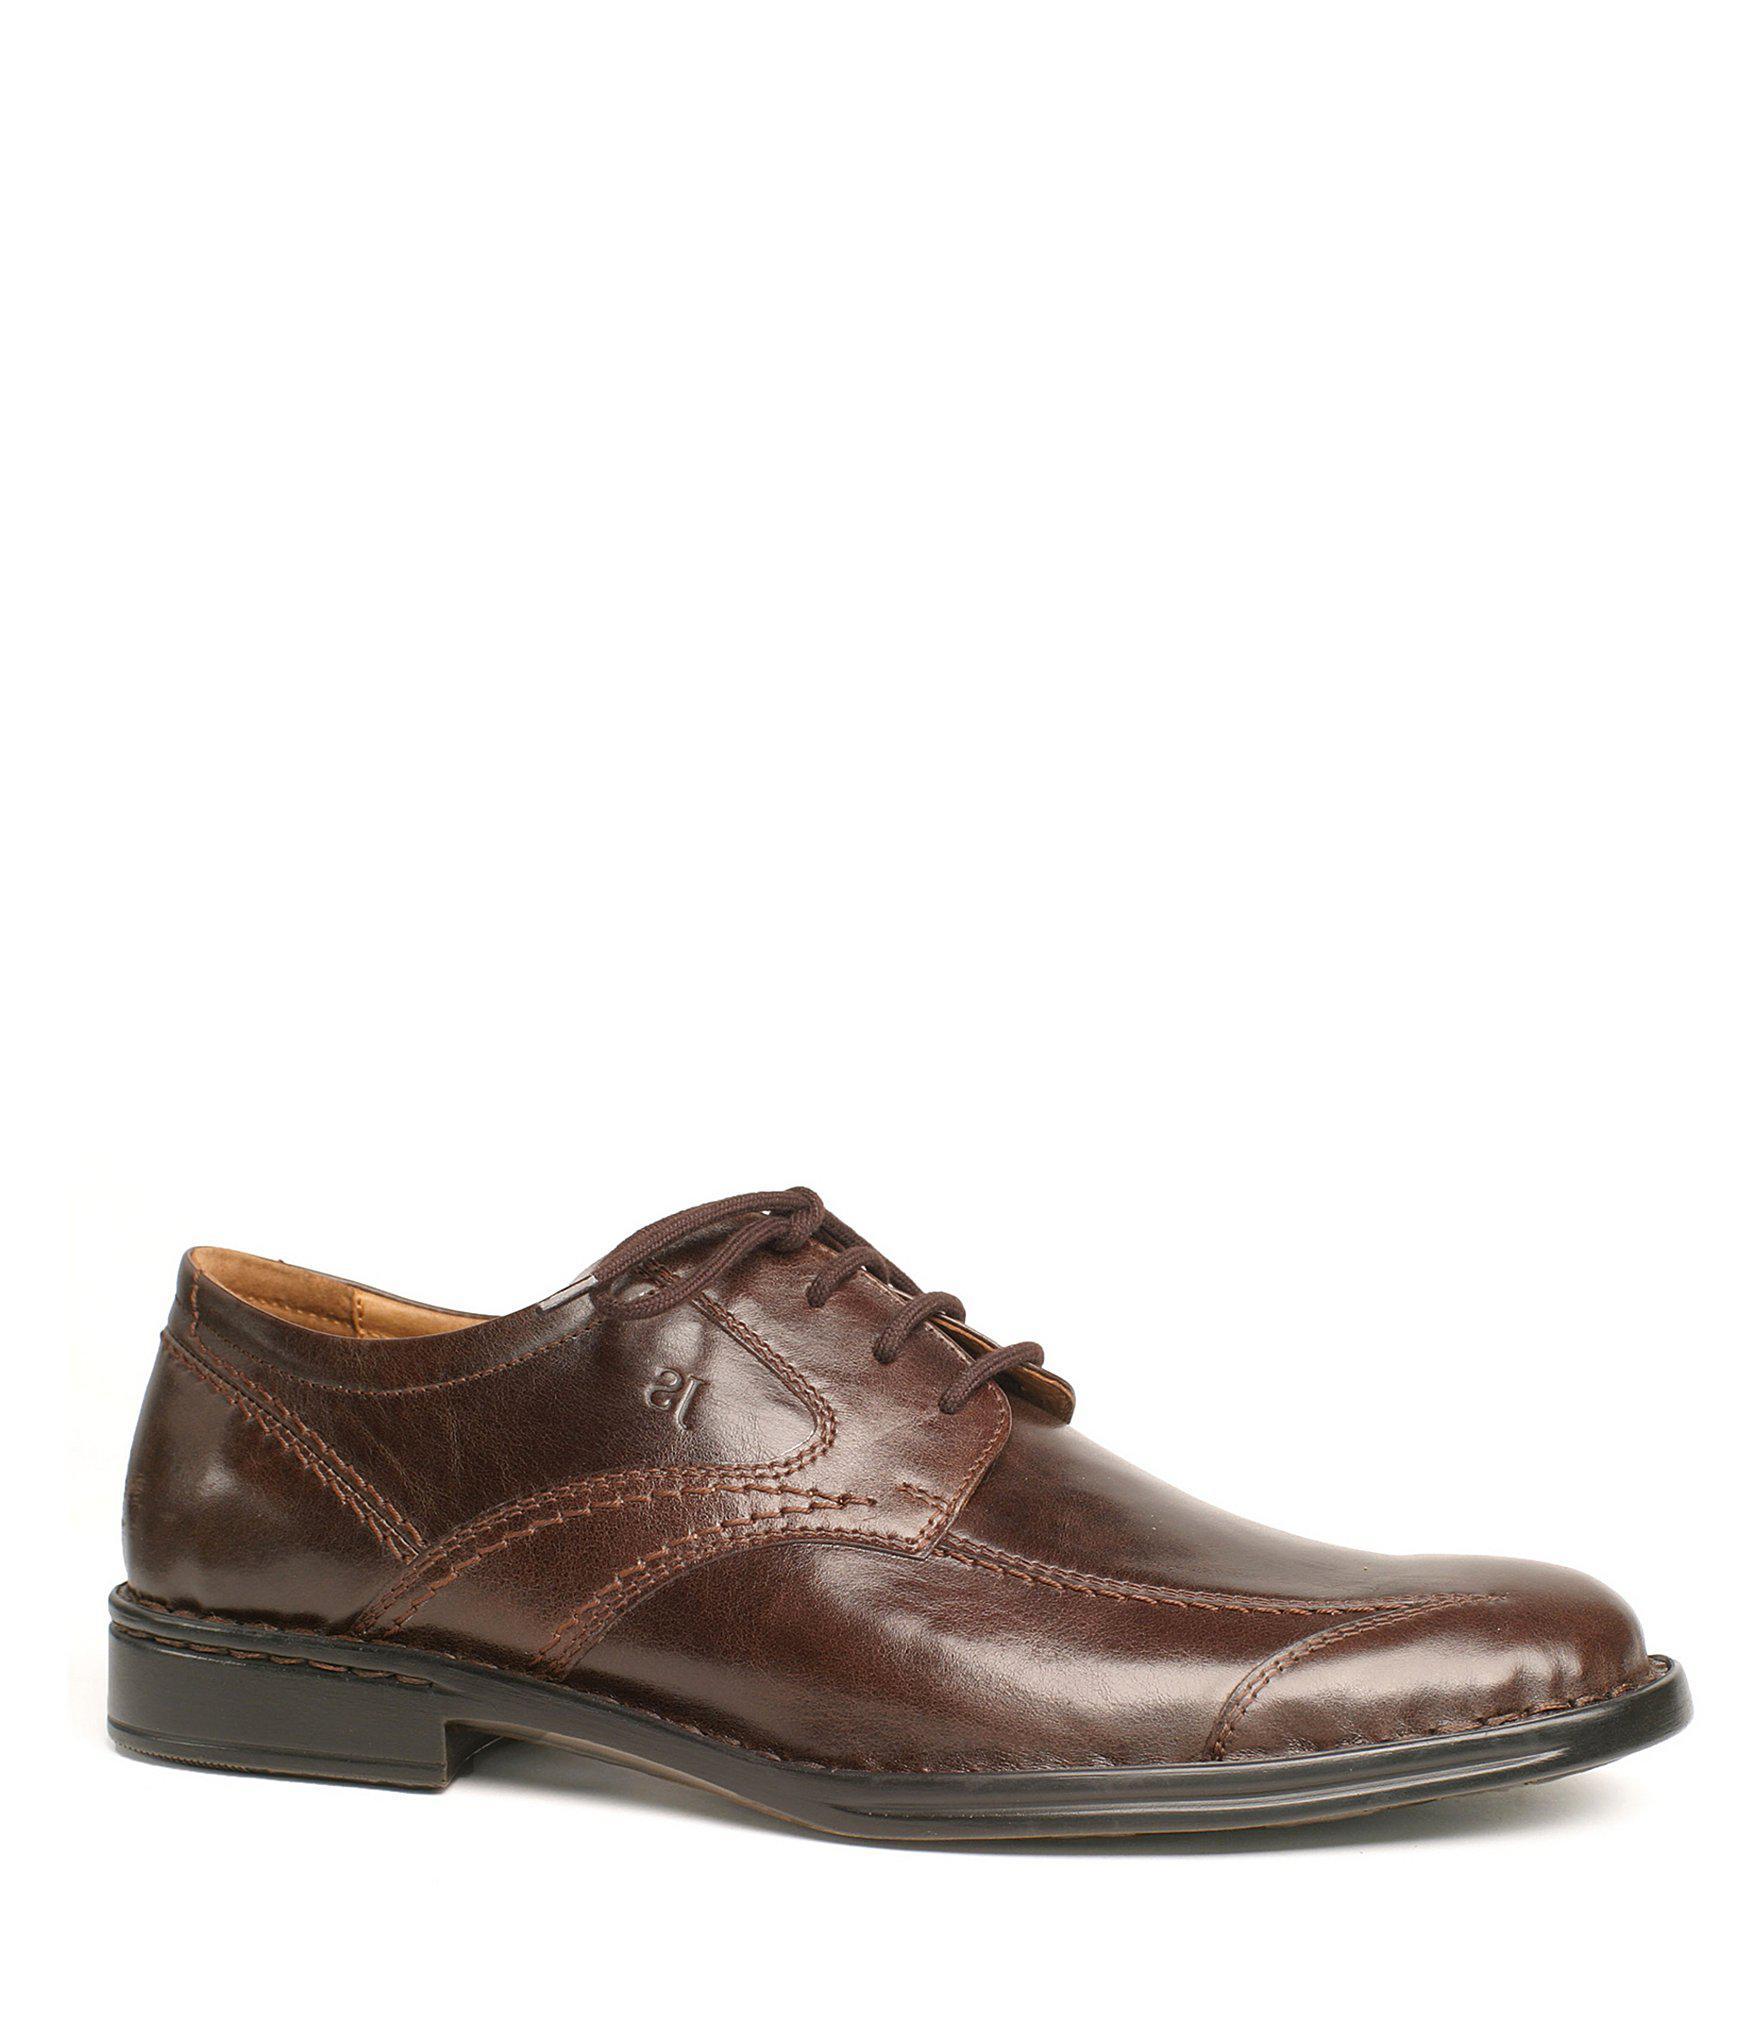 e891fd2e44212 Lyst - Josef Seibel Men's Douglas 05 Leather Dress Shoes in Brown ...